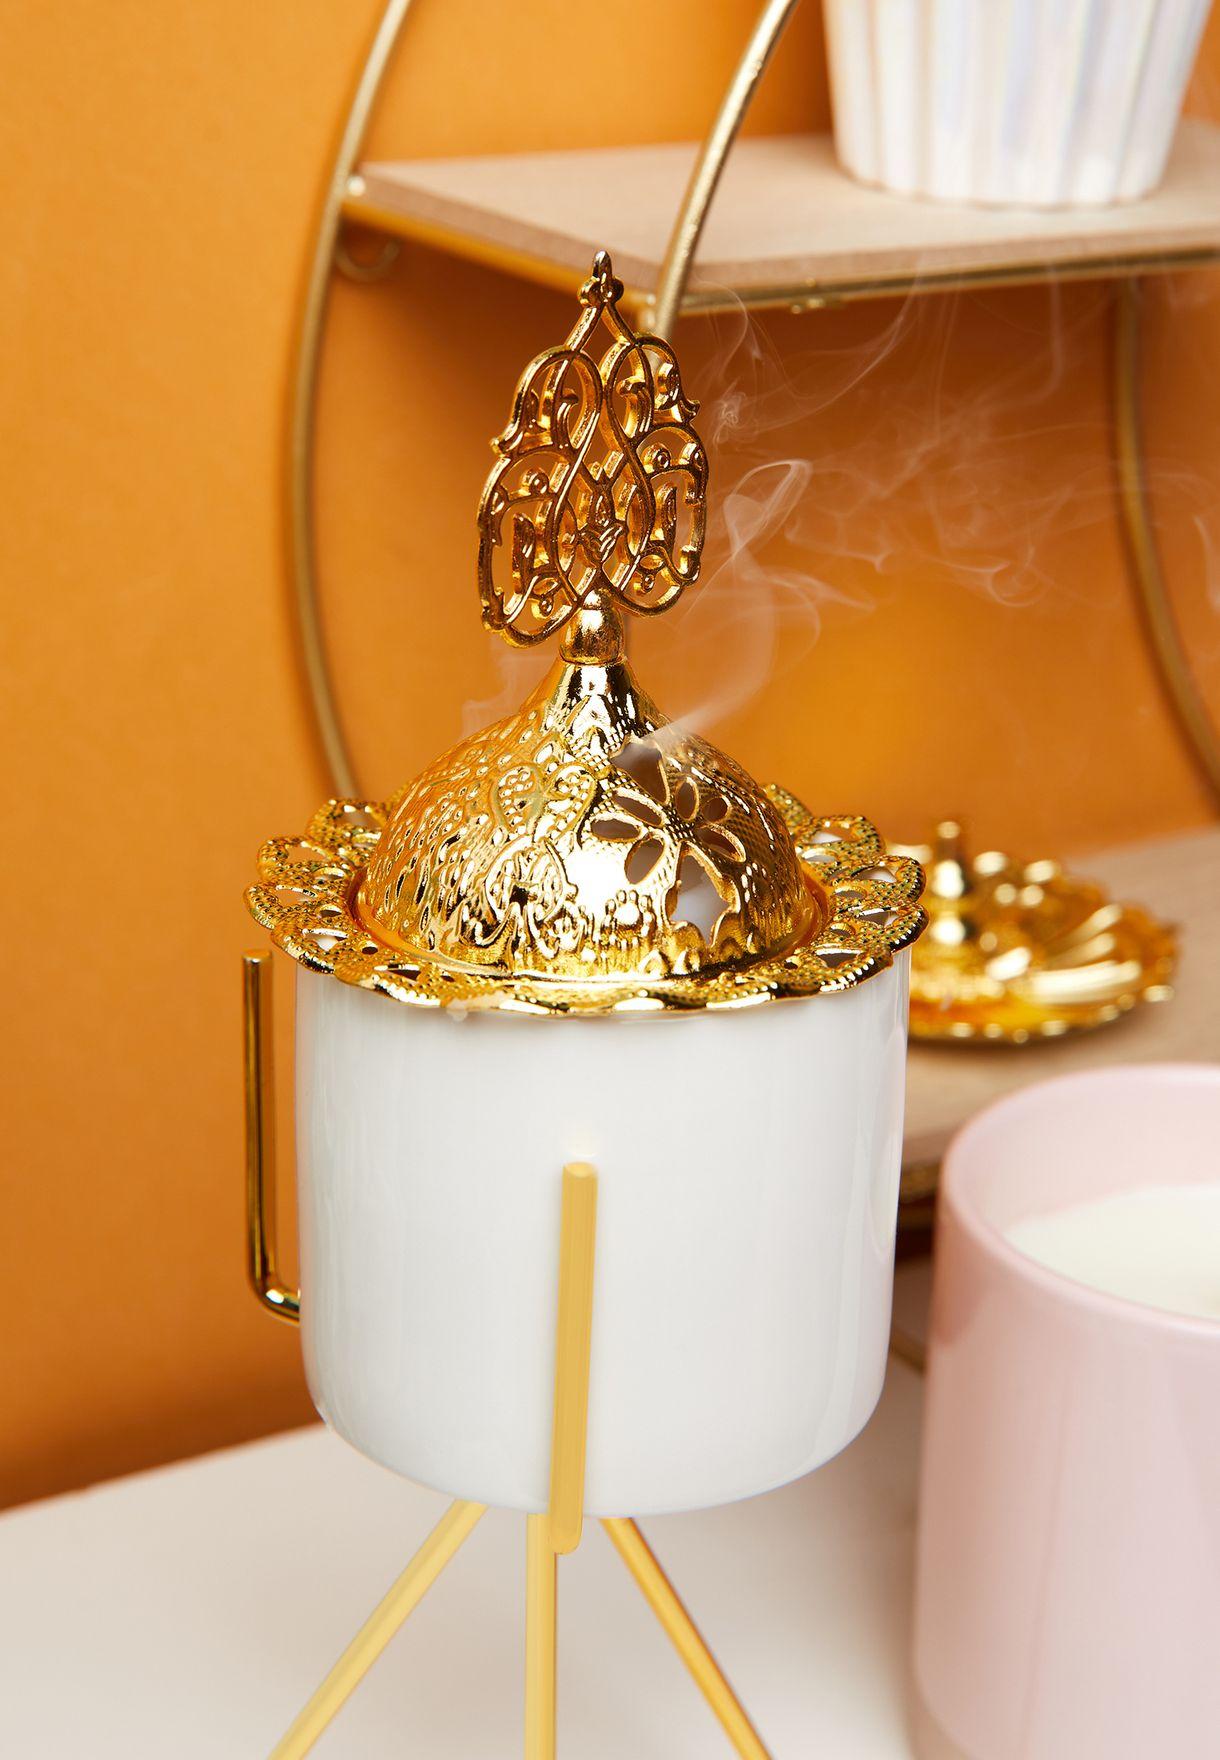 Arabic Incense Burner